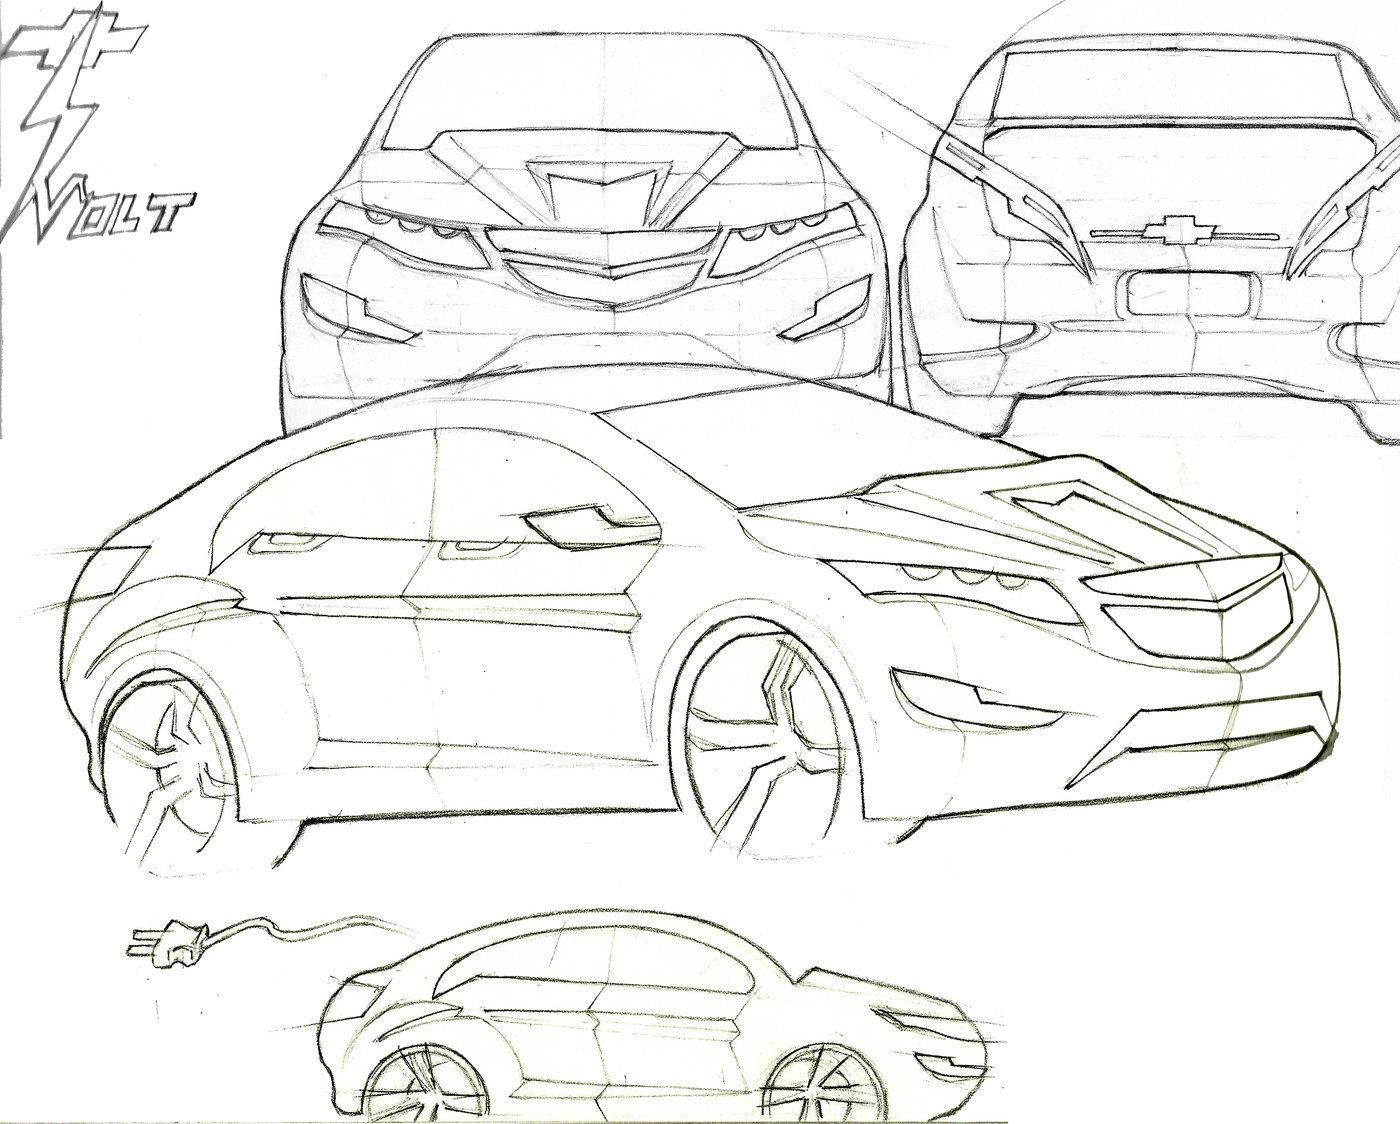 automotive concept sketches by gebre mesquitta at coroflot com